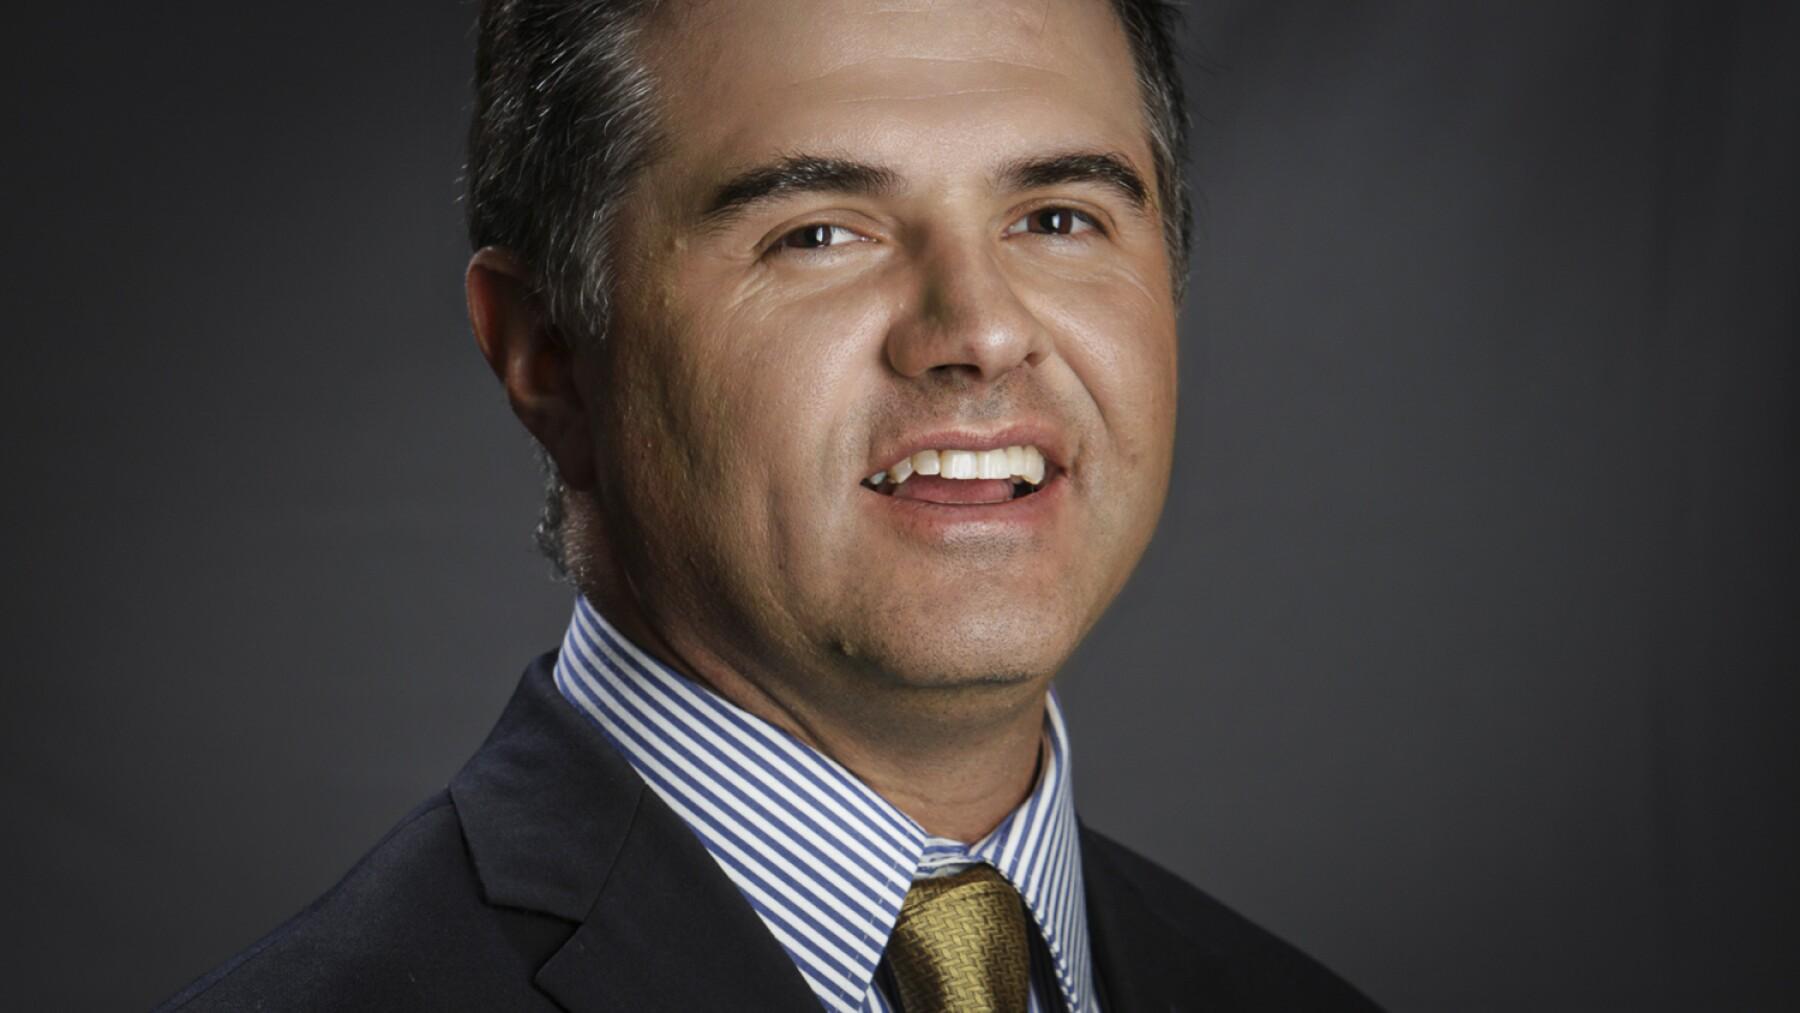 Nicolás Amaya